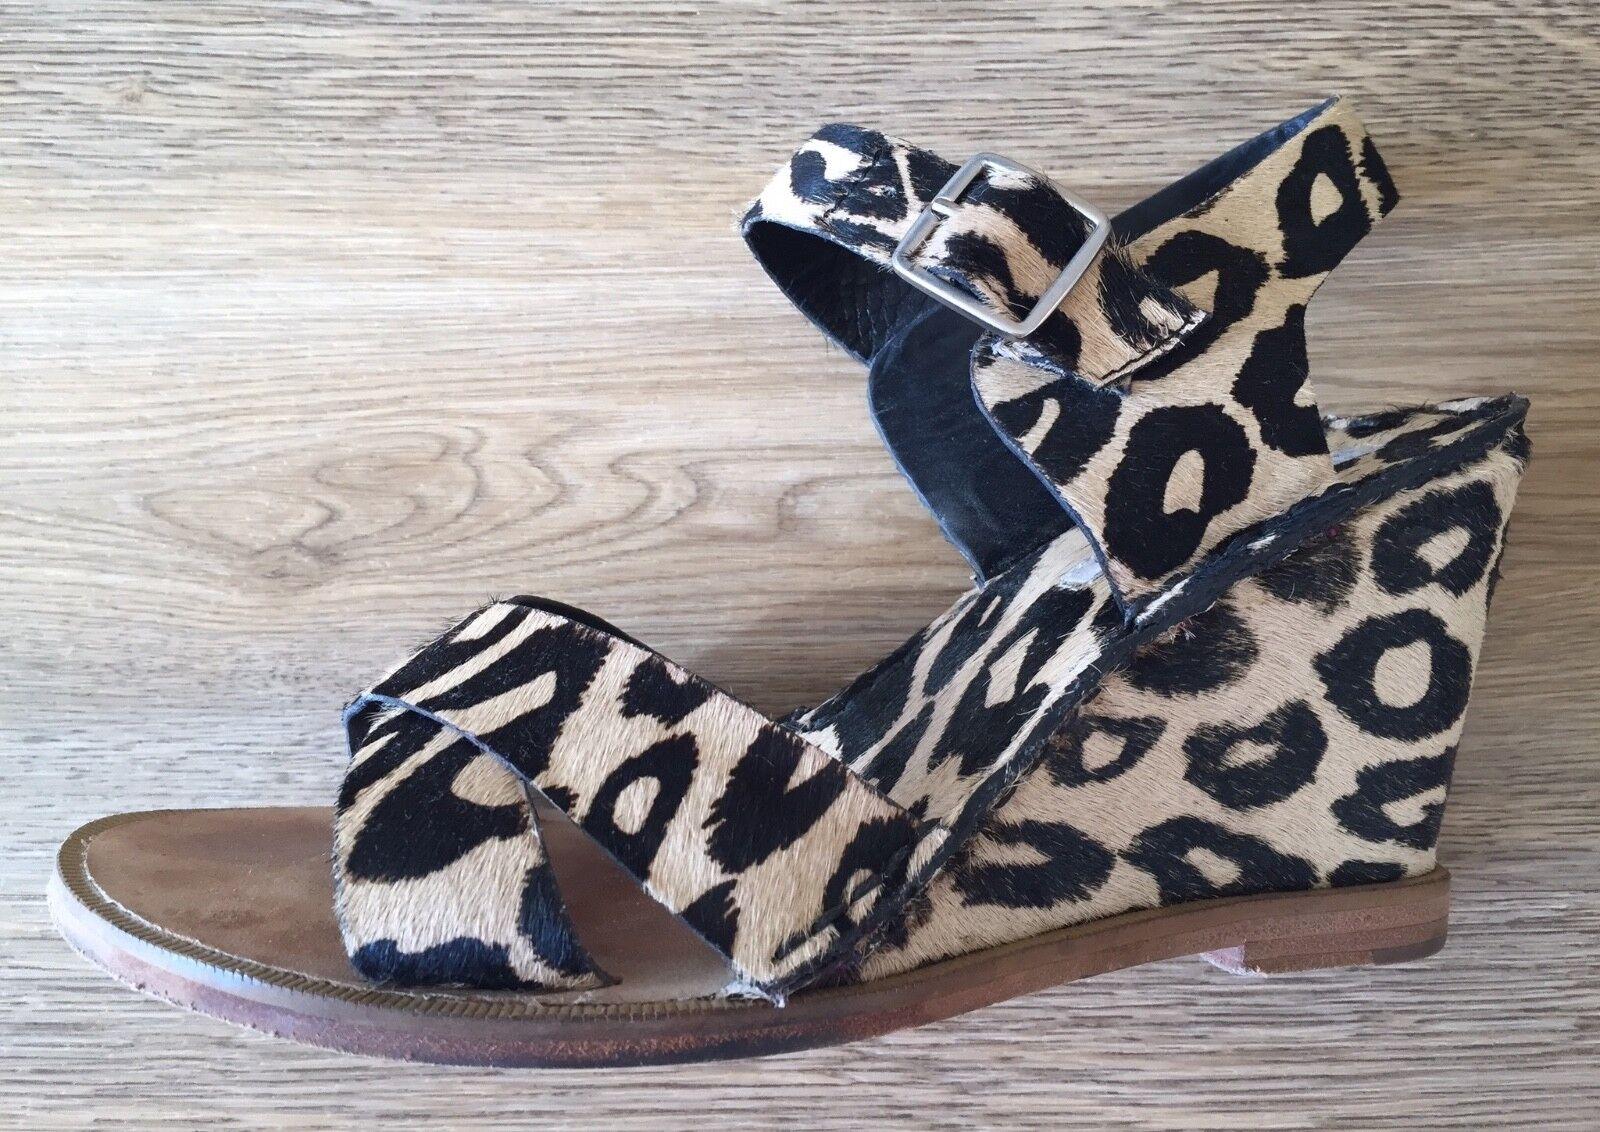 Diane Von Von Von Furstenberg Estampado de Leopardo haircalf Sandalia de cuña US7.5 381ada